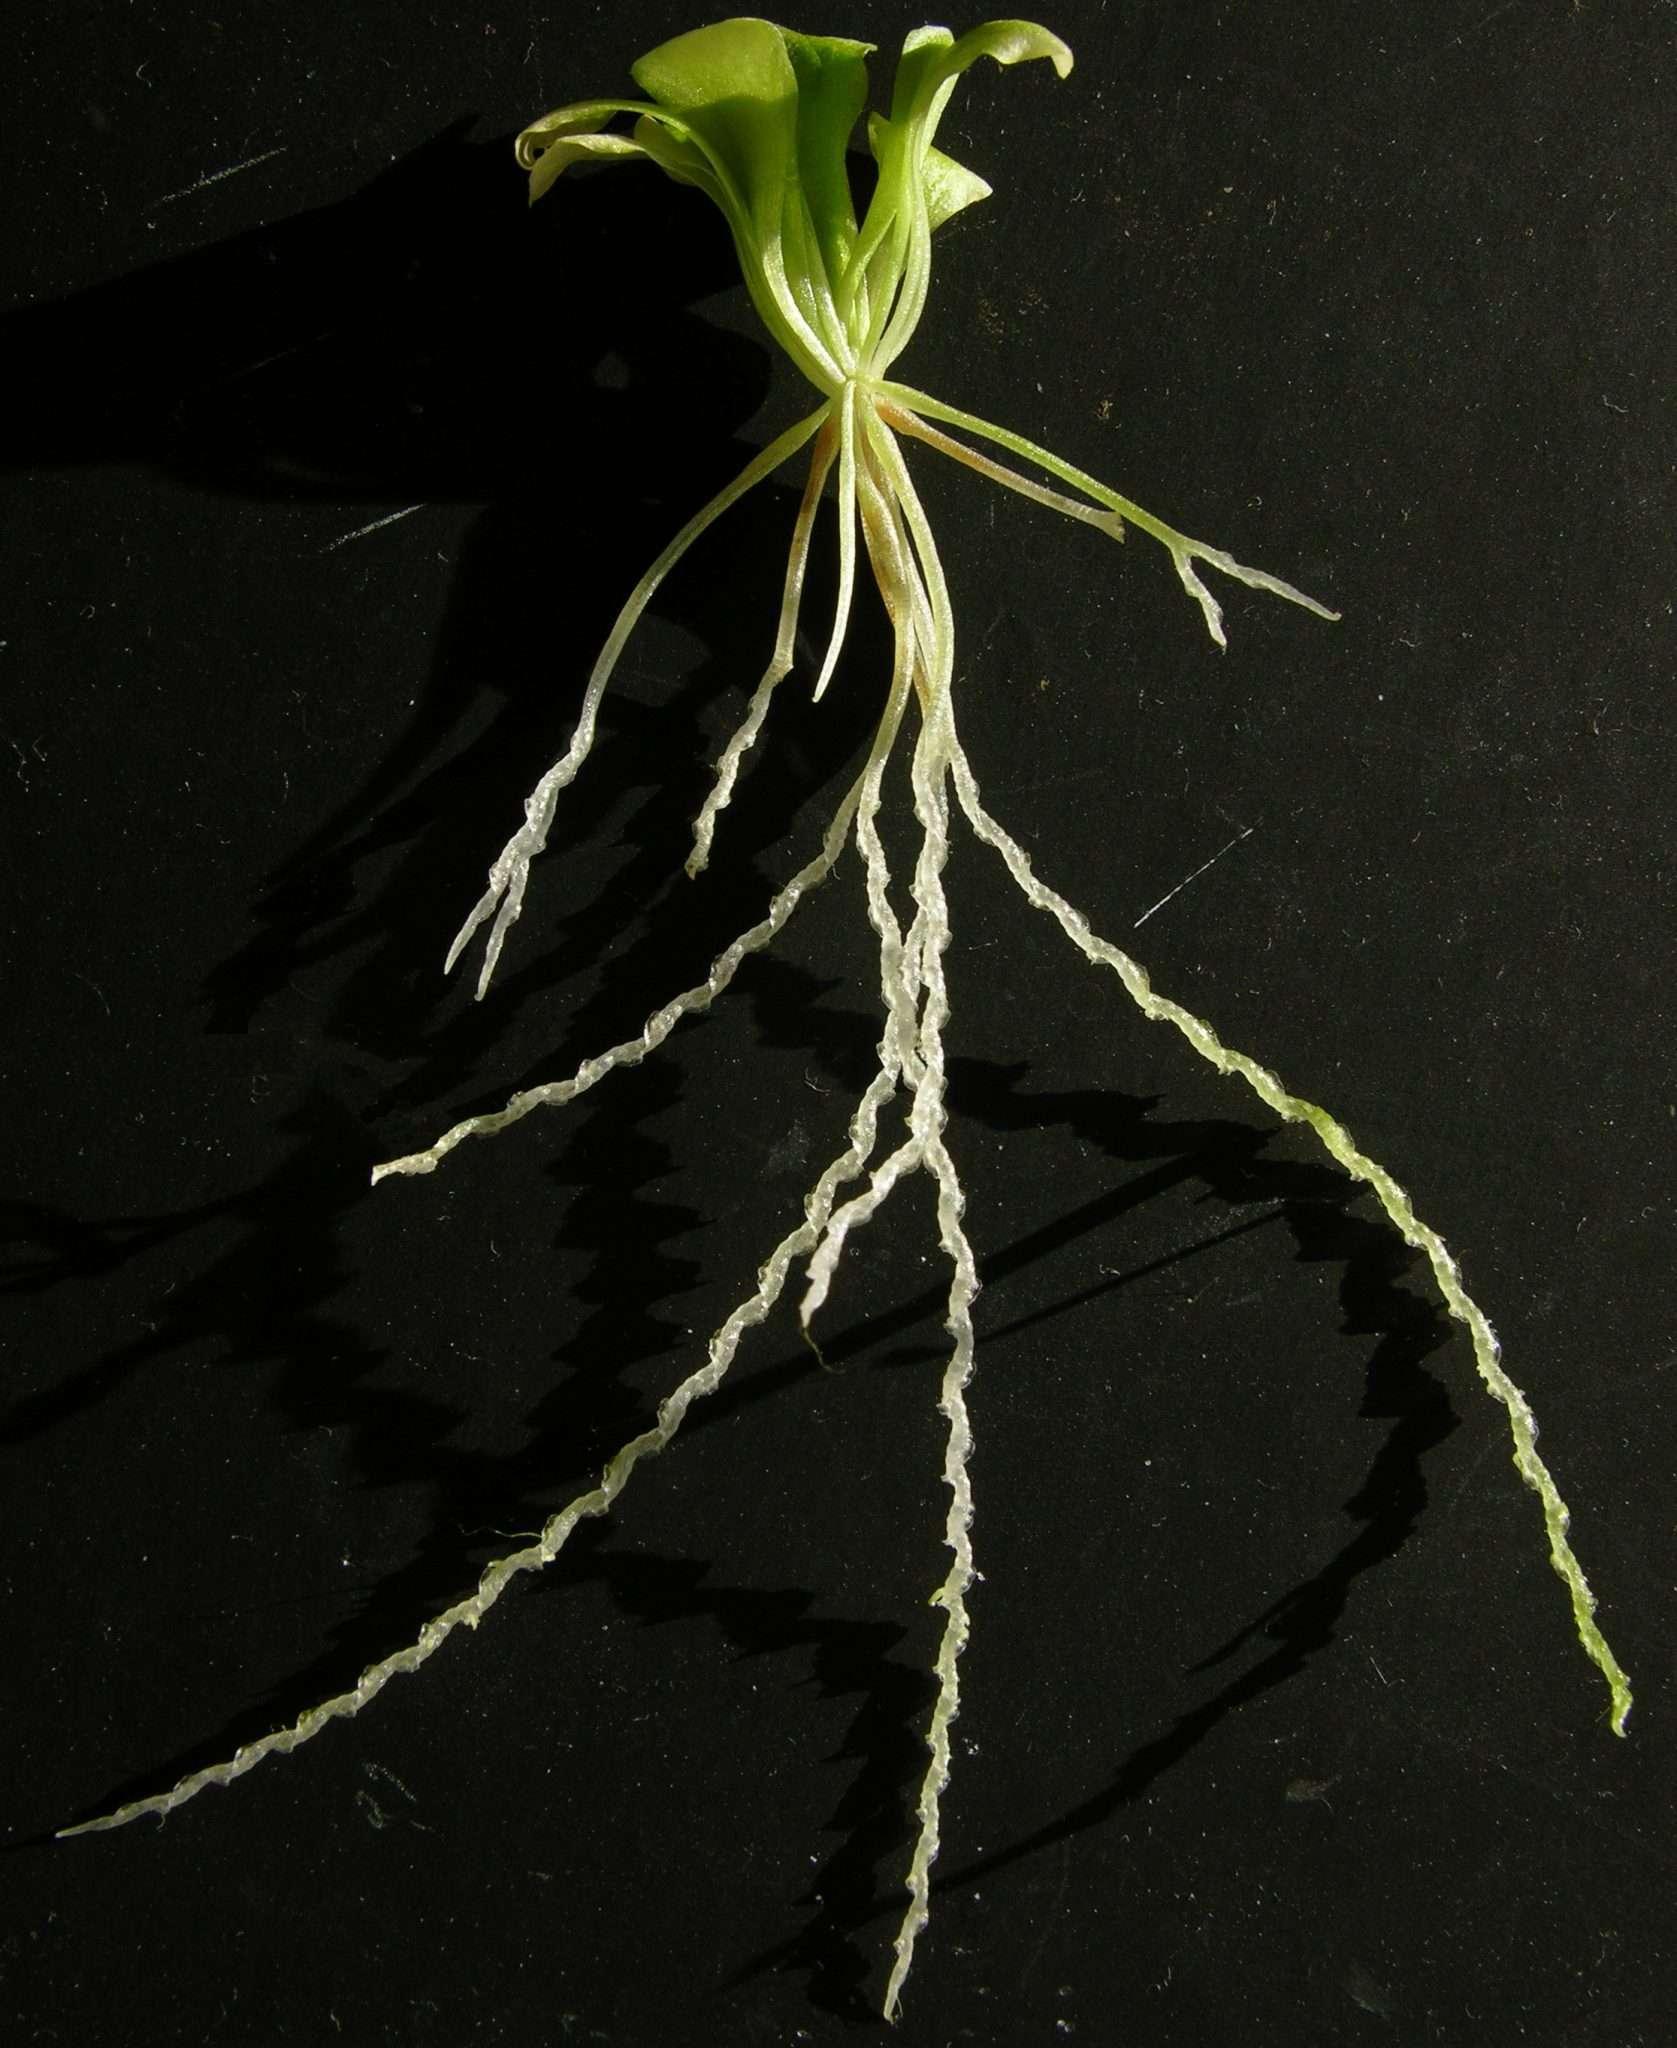 Corkscrew Plant - Genlisea